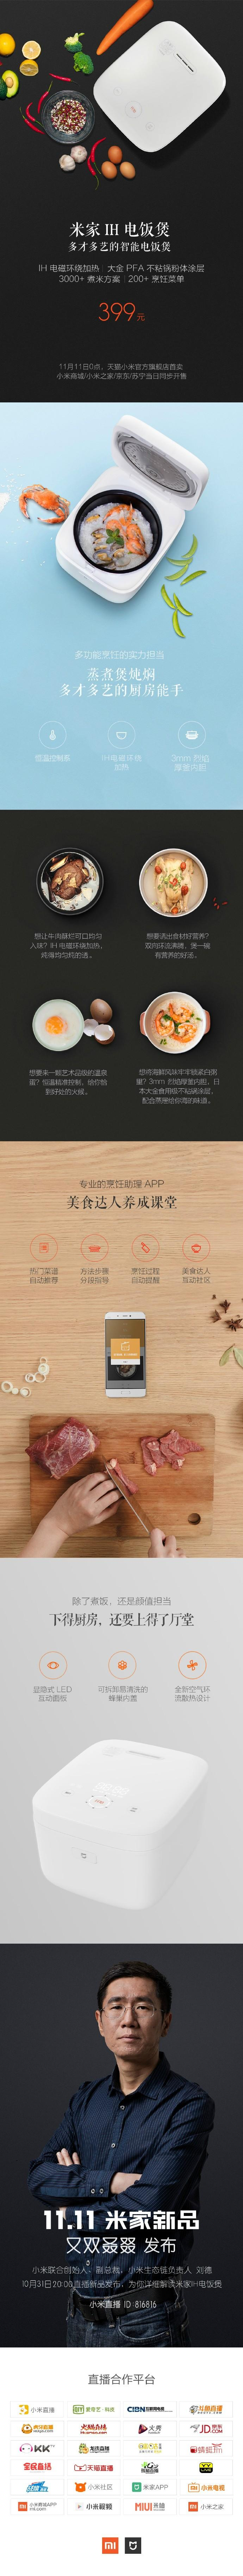 xiaomi-cooker-5-1